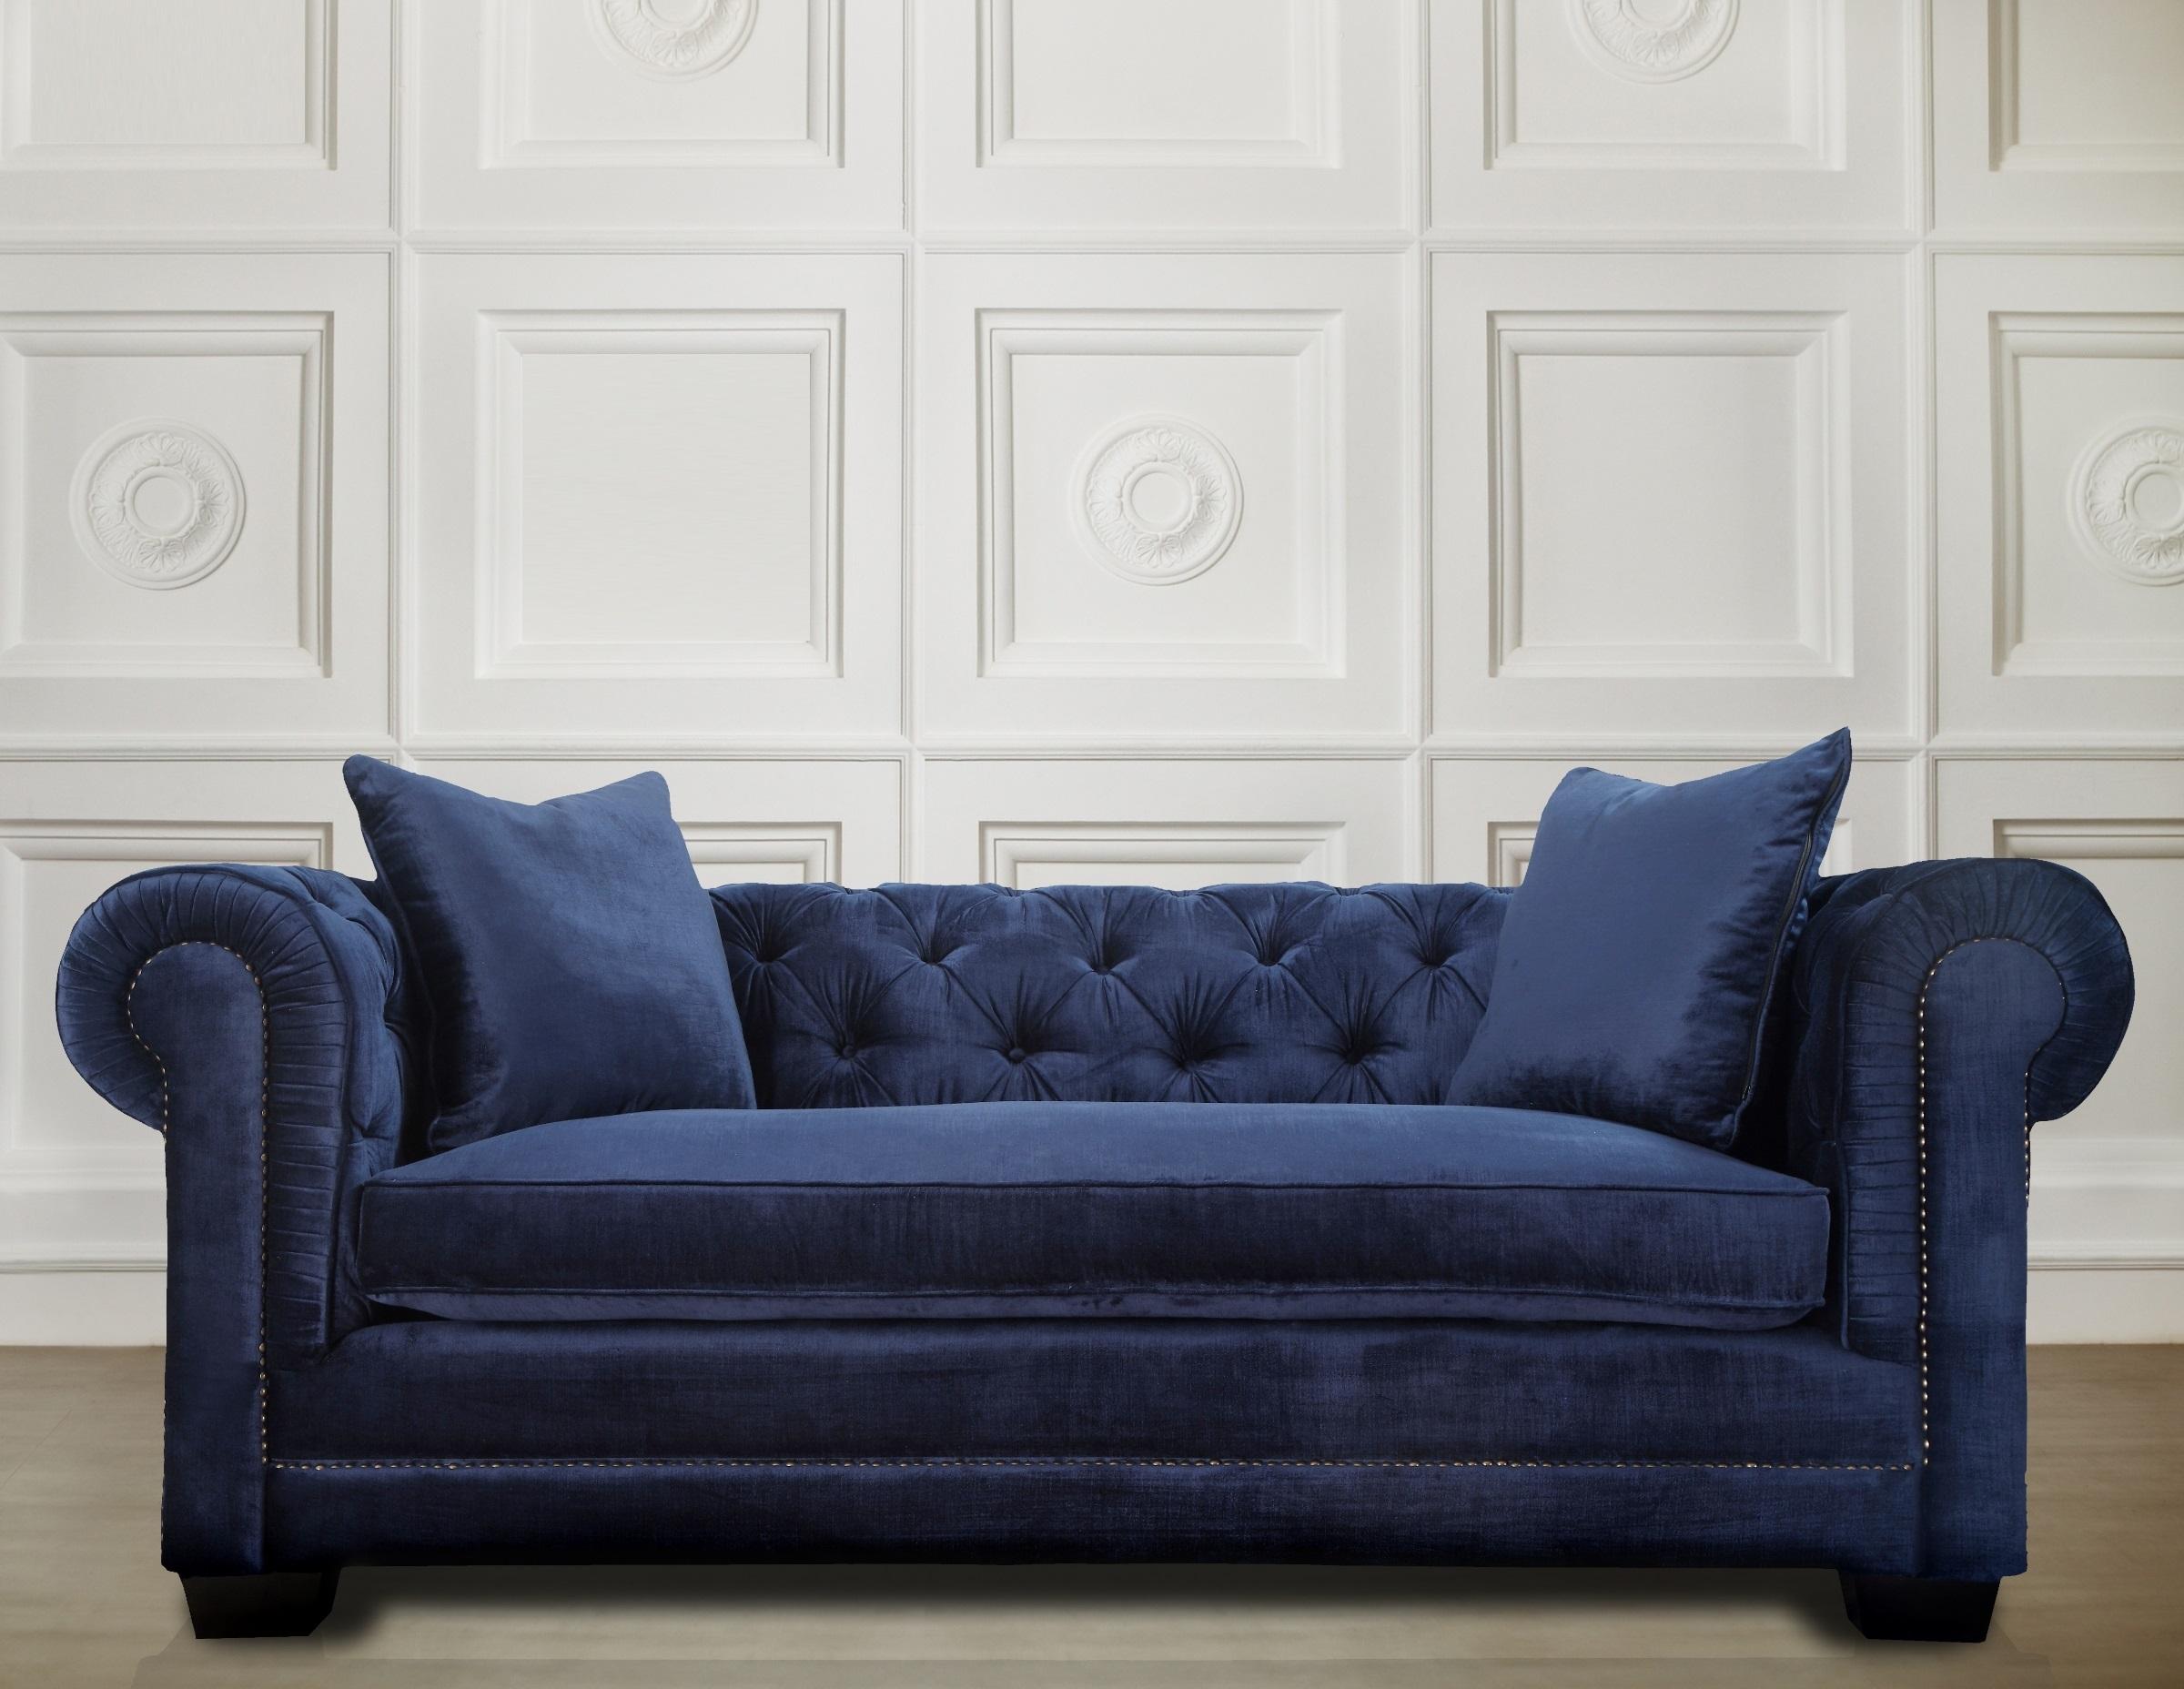 Stylish Blue Velvet Sofa